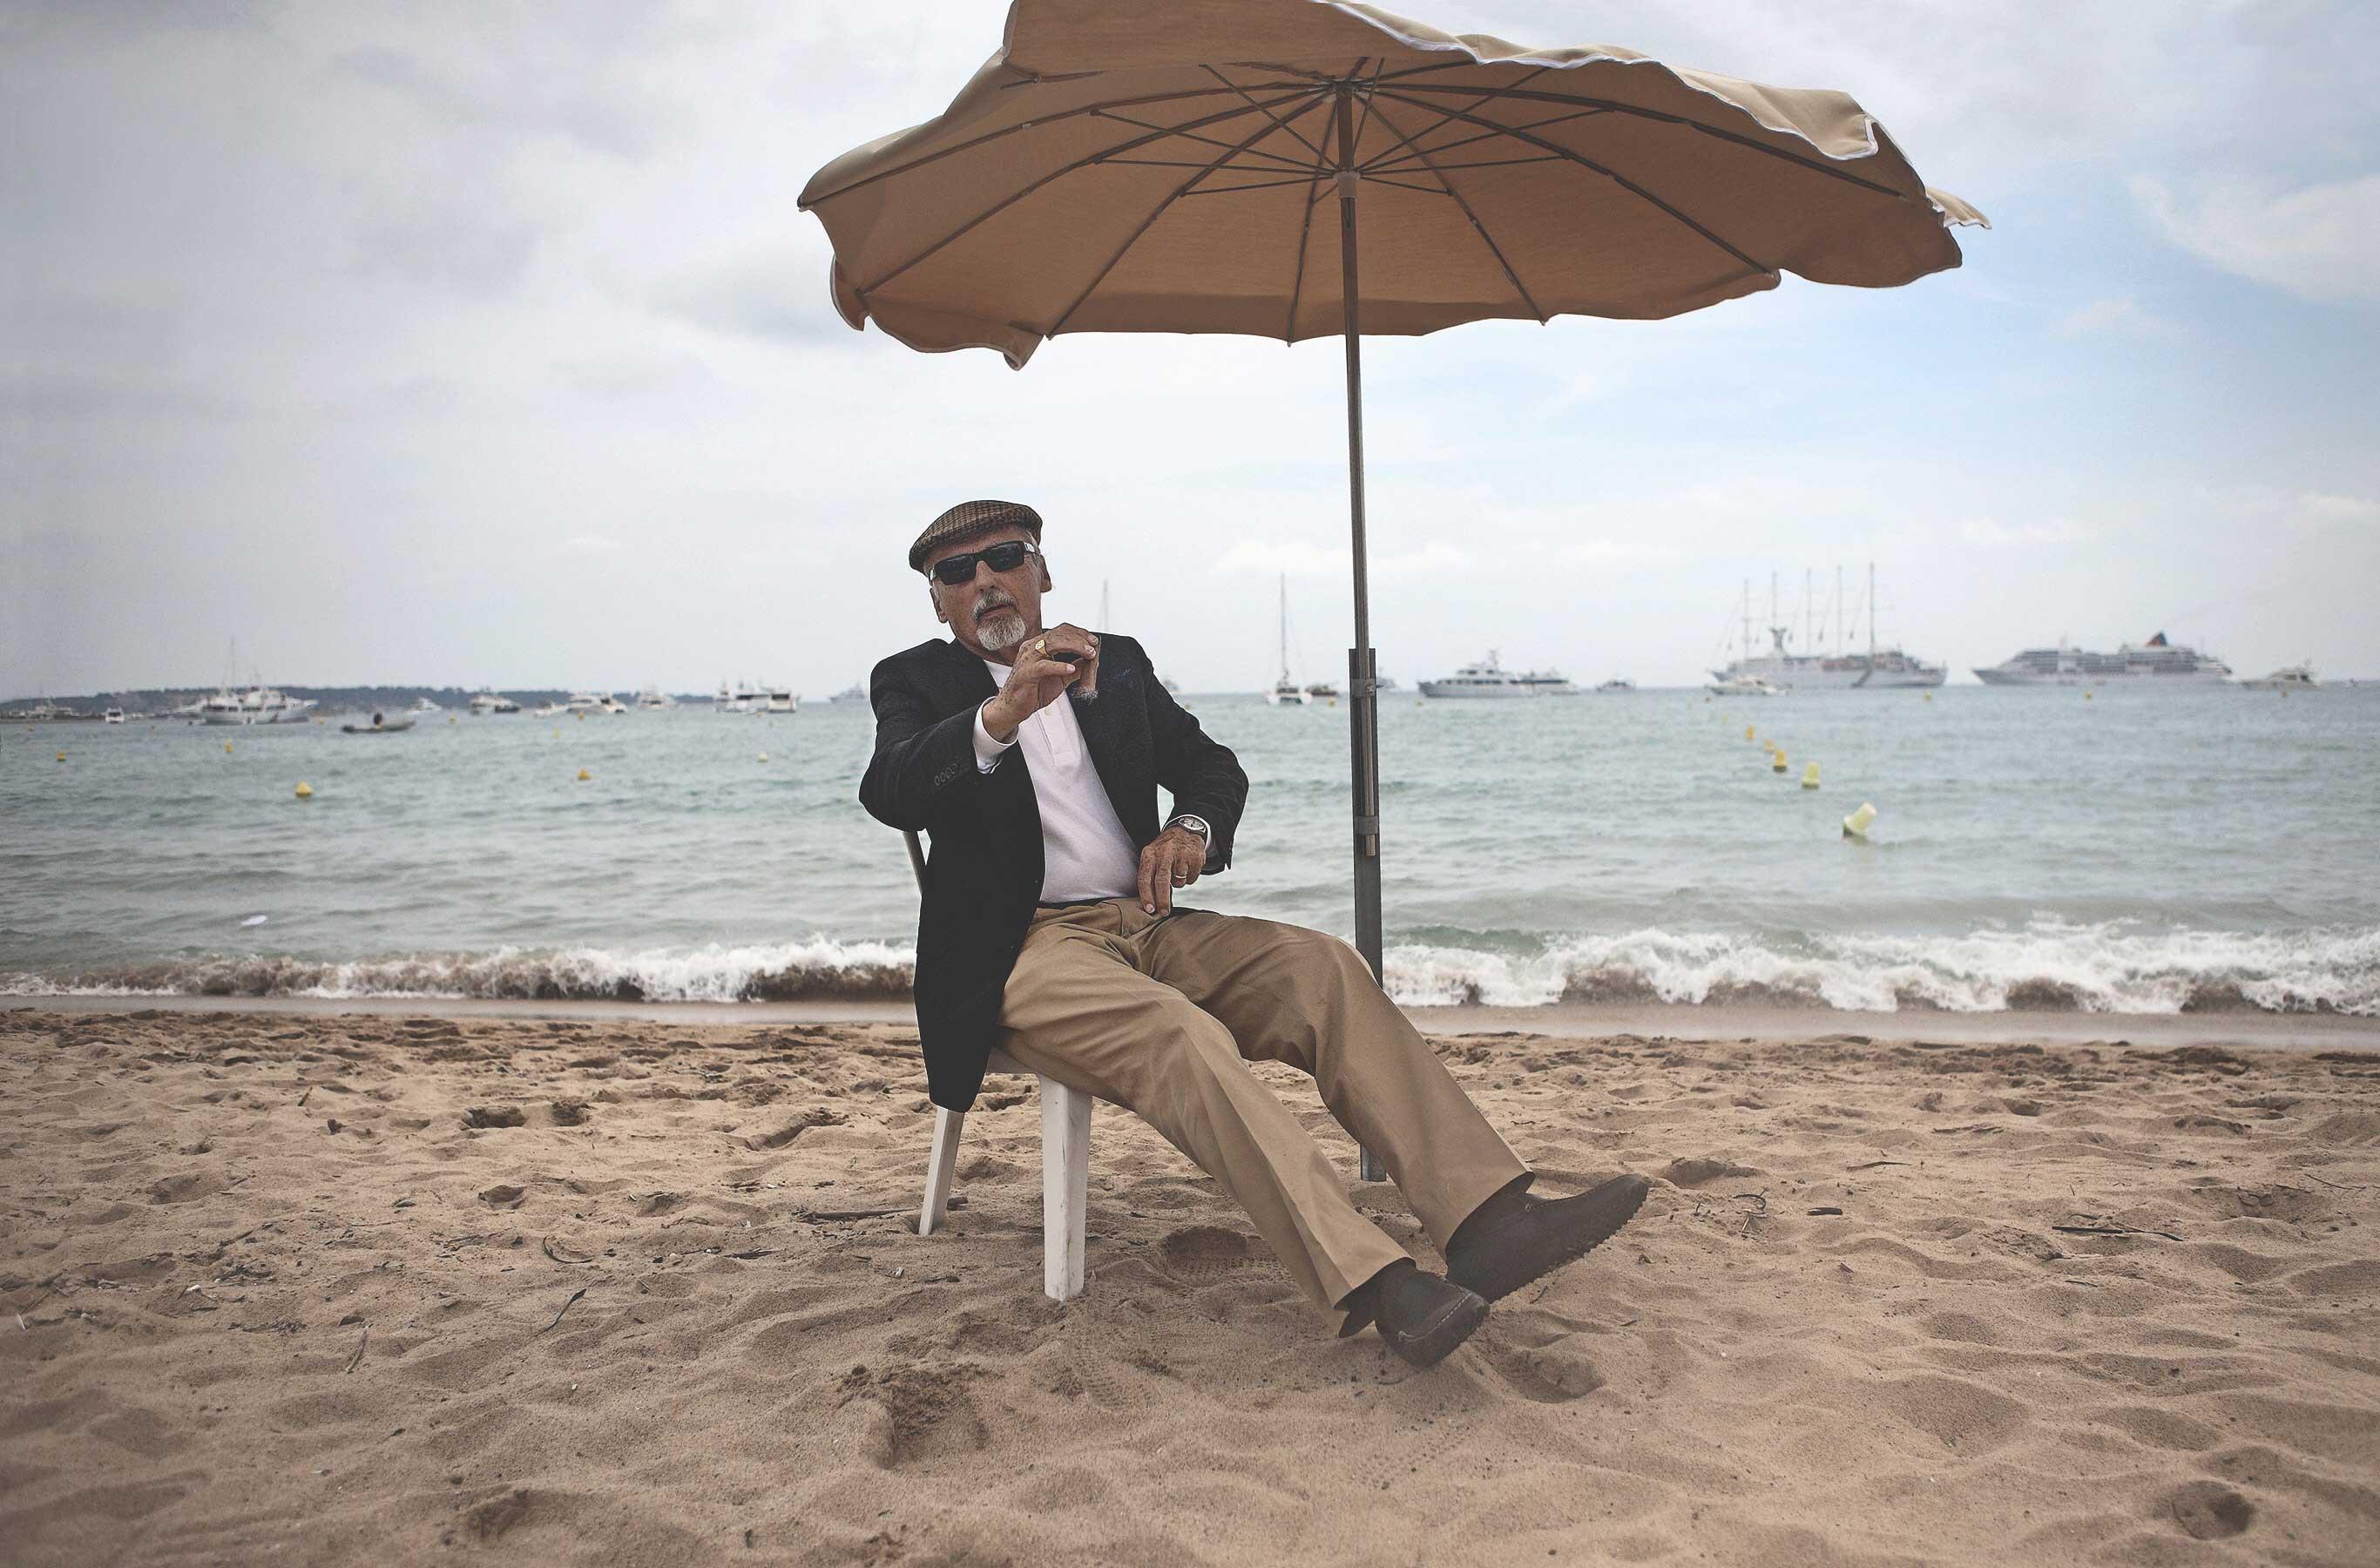 Dennis Hopper, by me